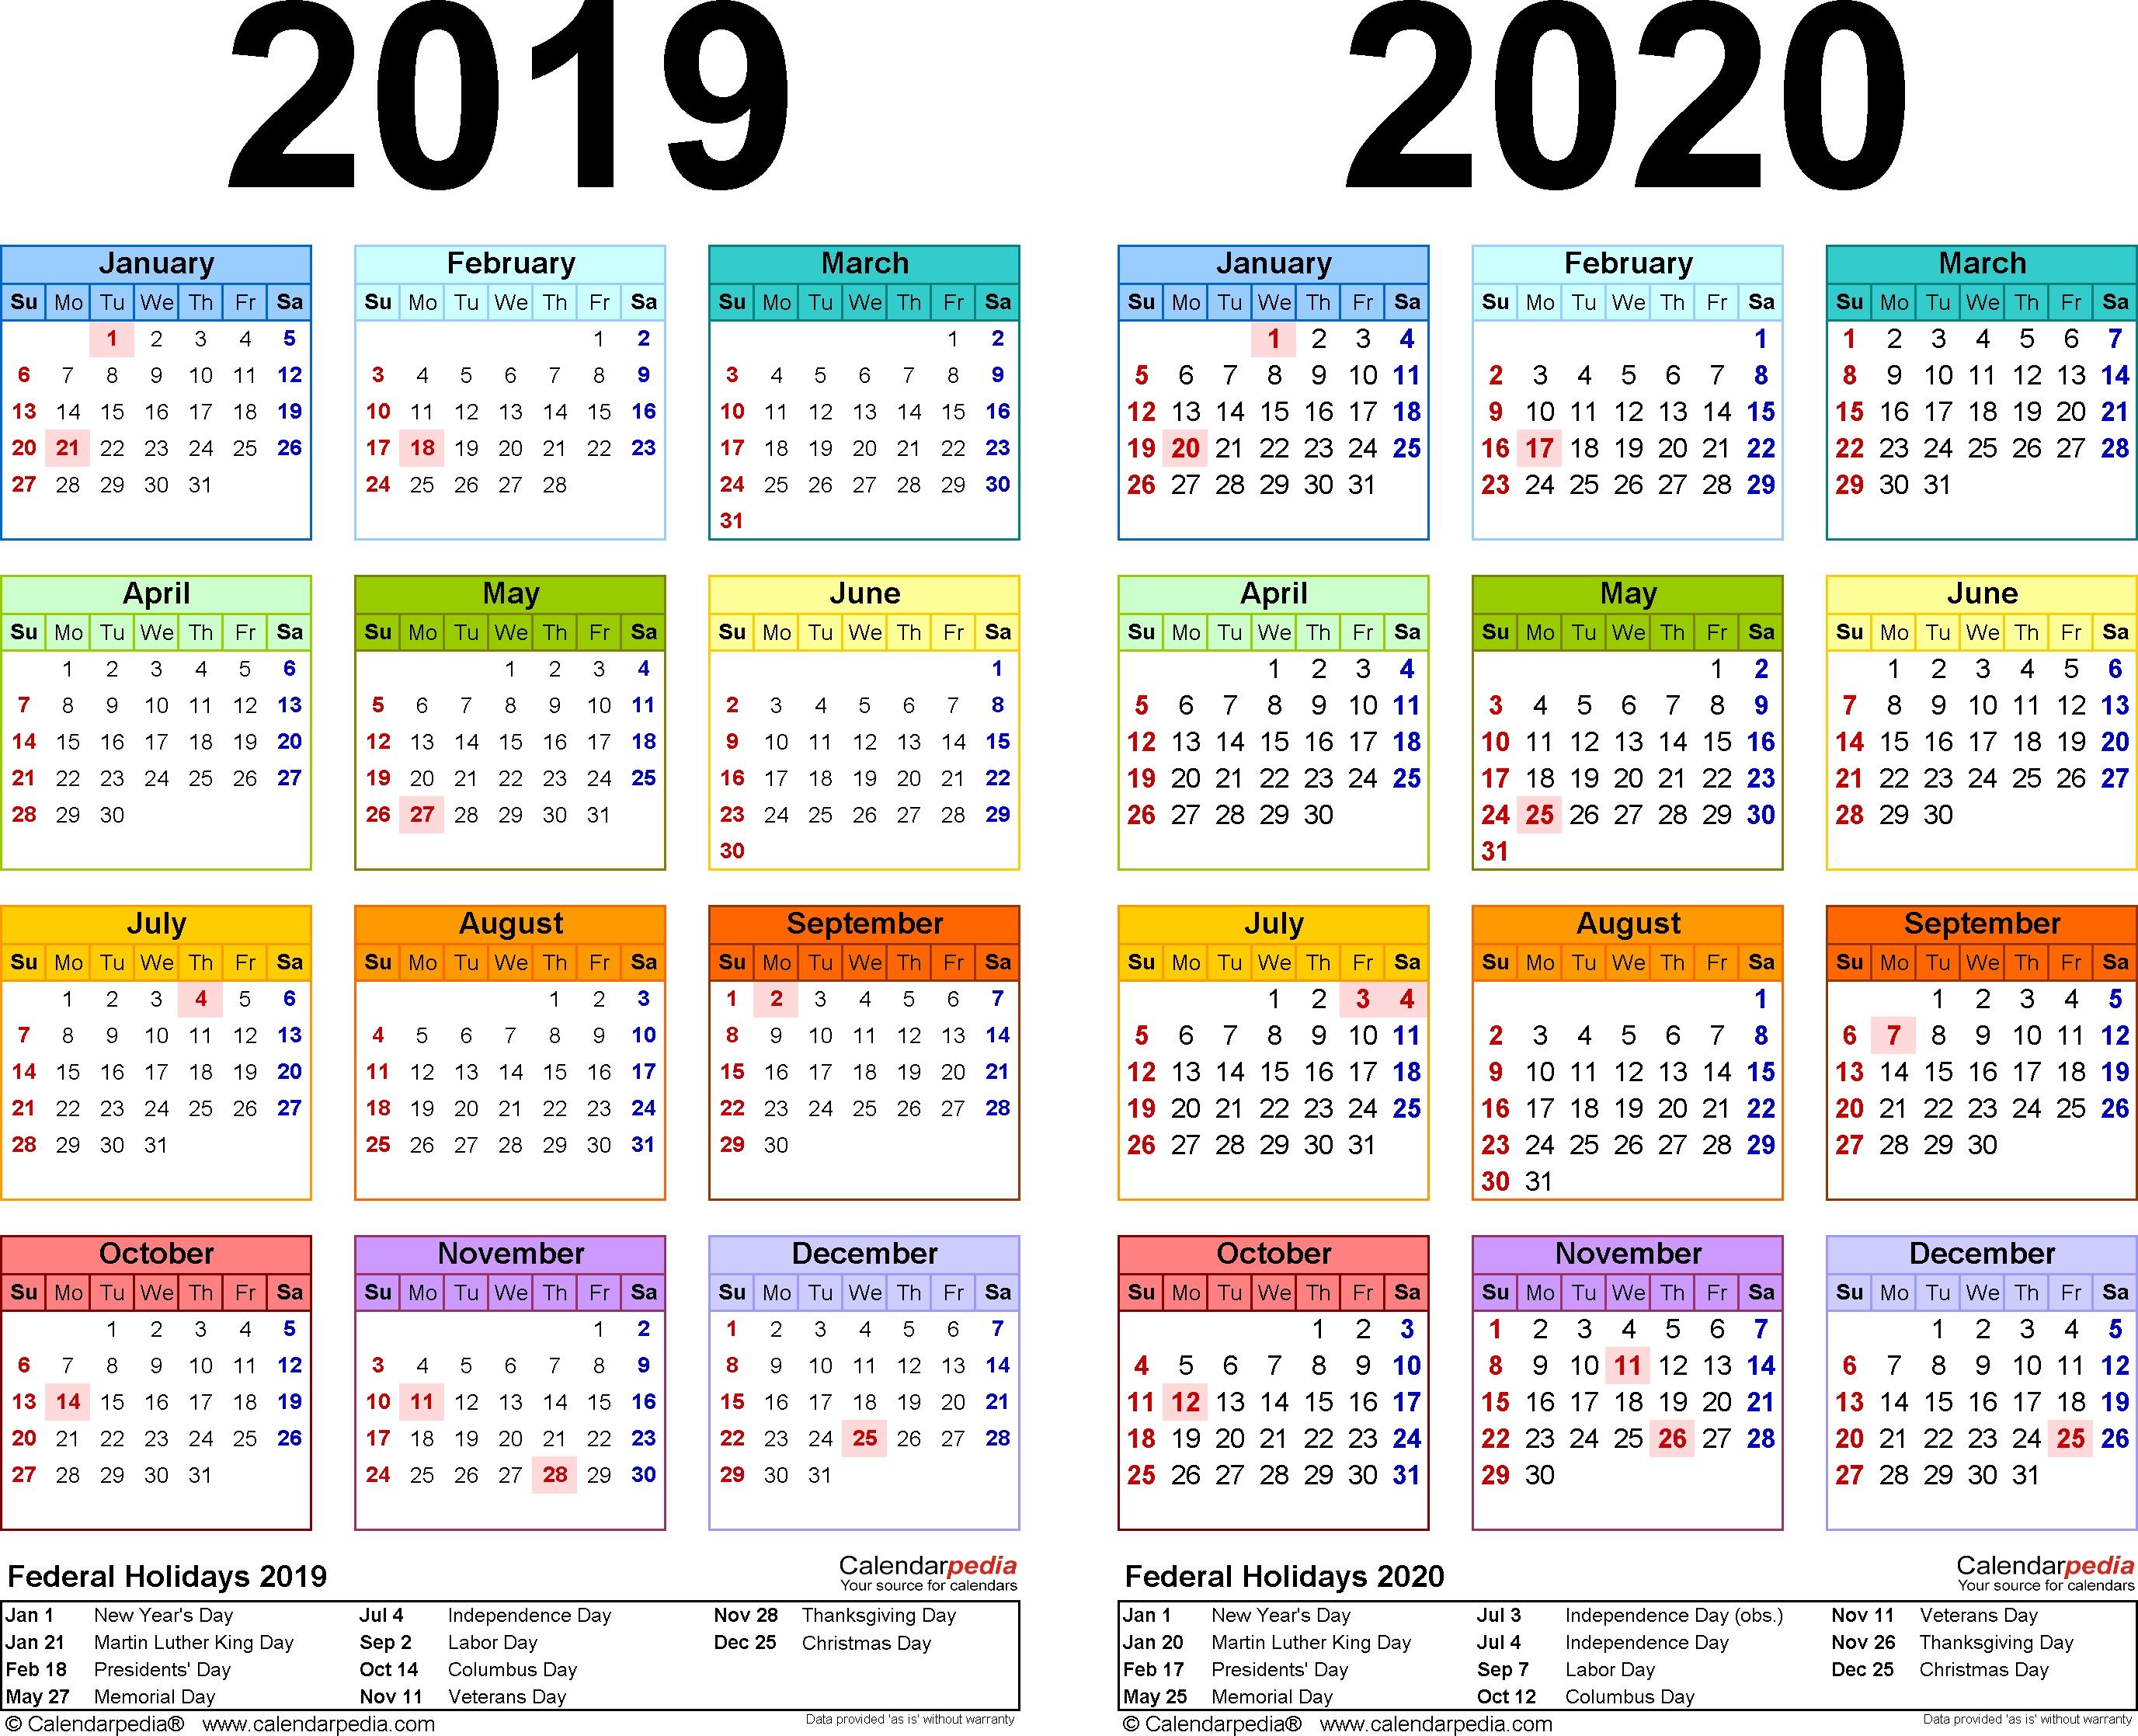 2019-2020 Calendar - Free Printable Two-Year Pdf Calendars with Printable Year At A Glance Calendar 2019-2020